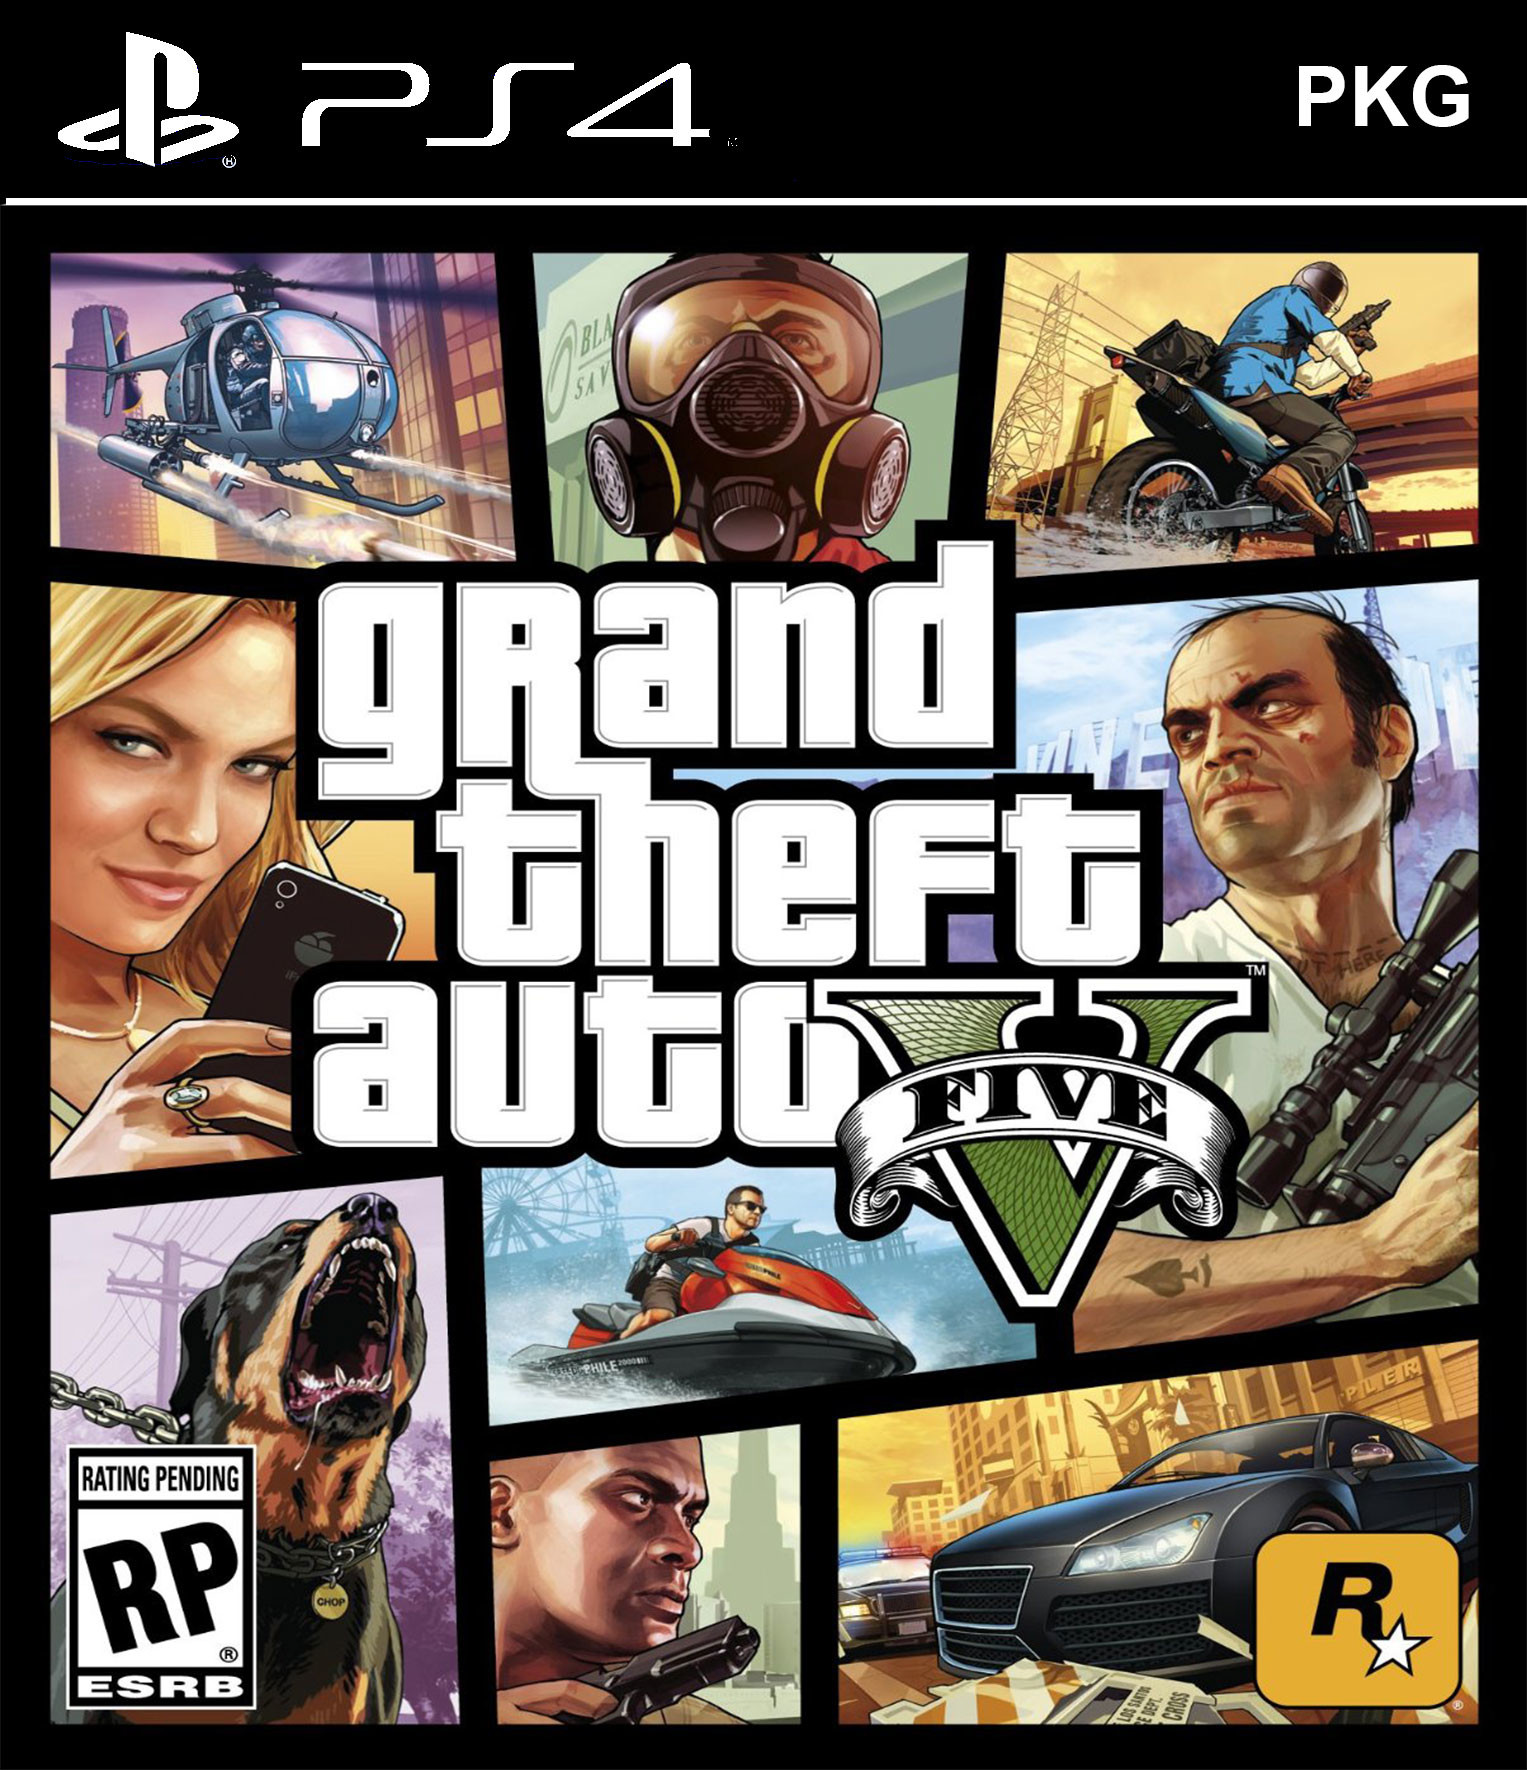 Grand Theft Auto V PKG Oyun İndir ! [4.05